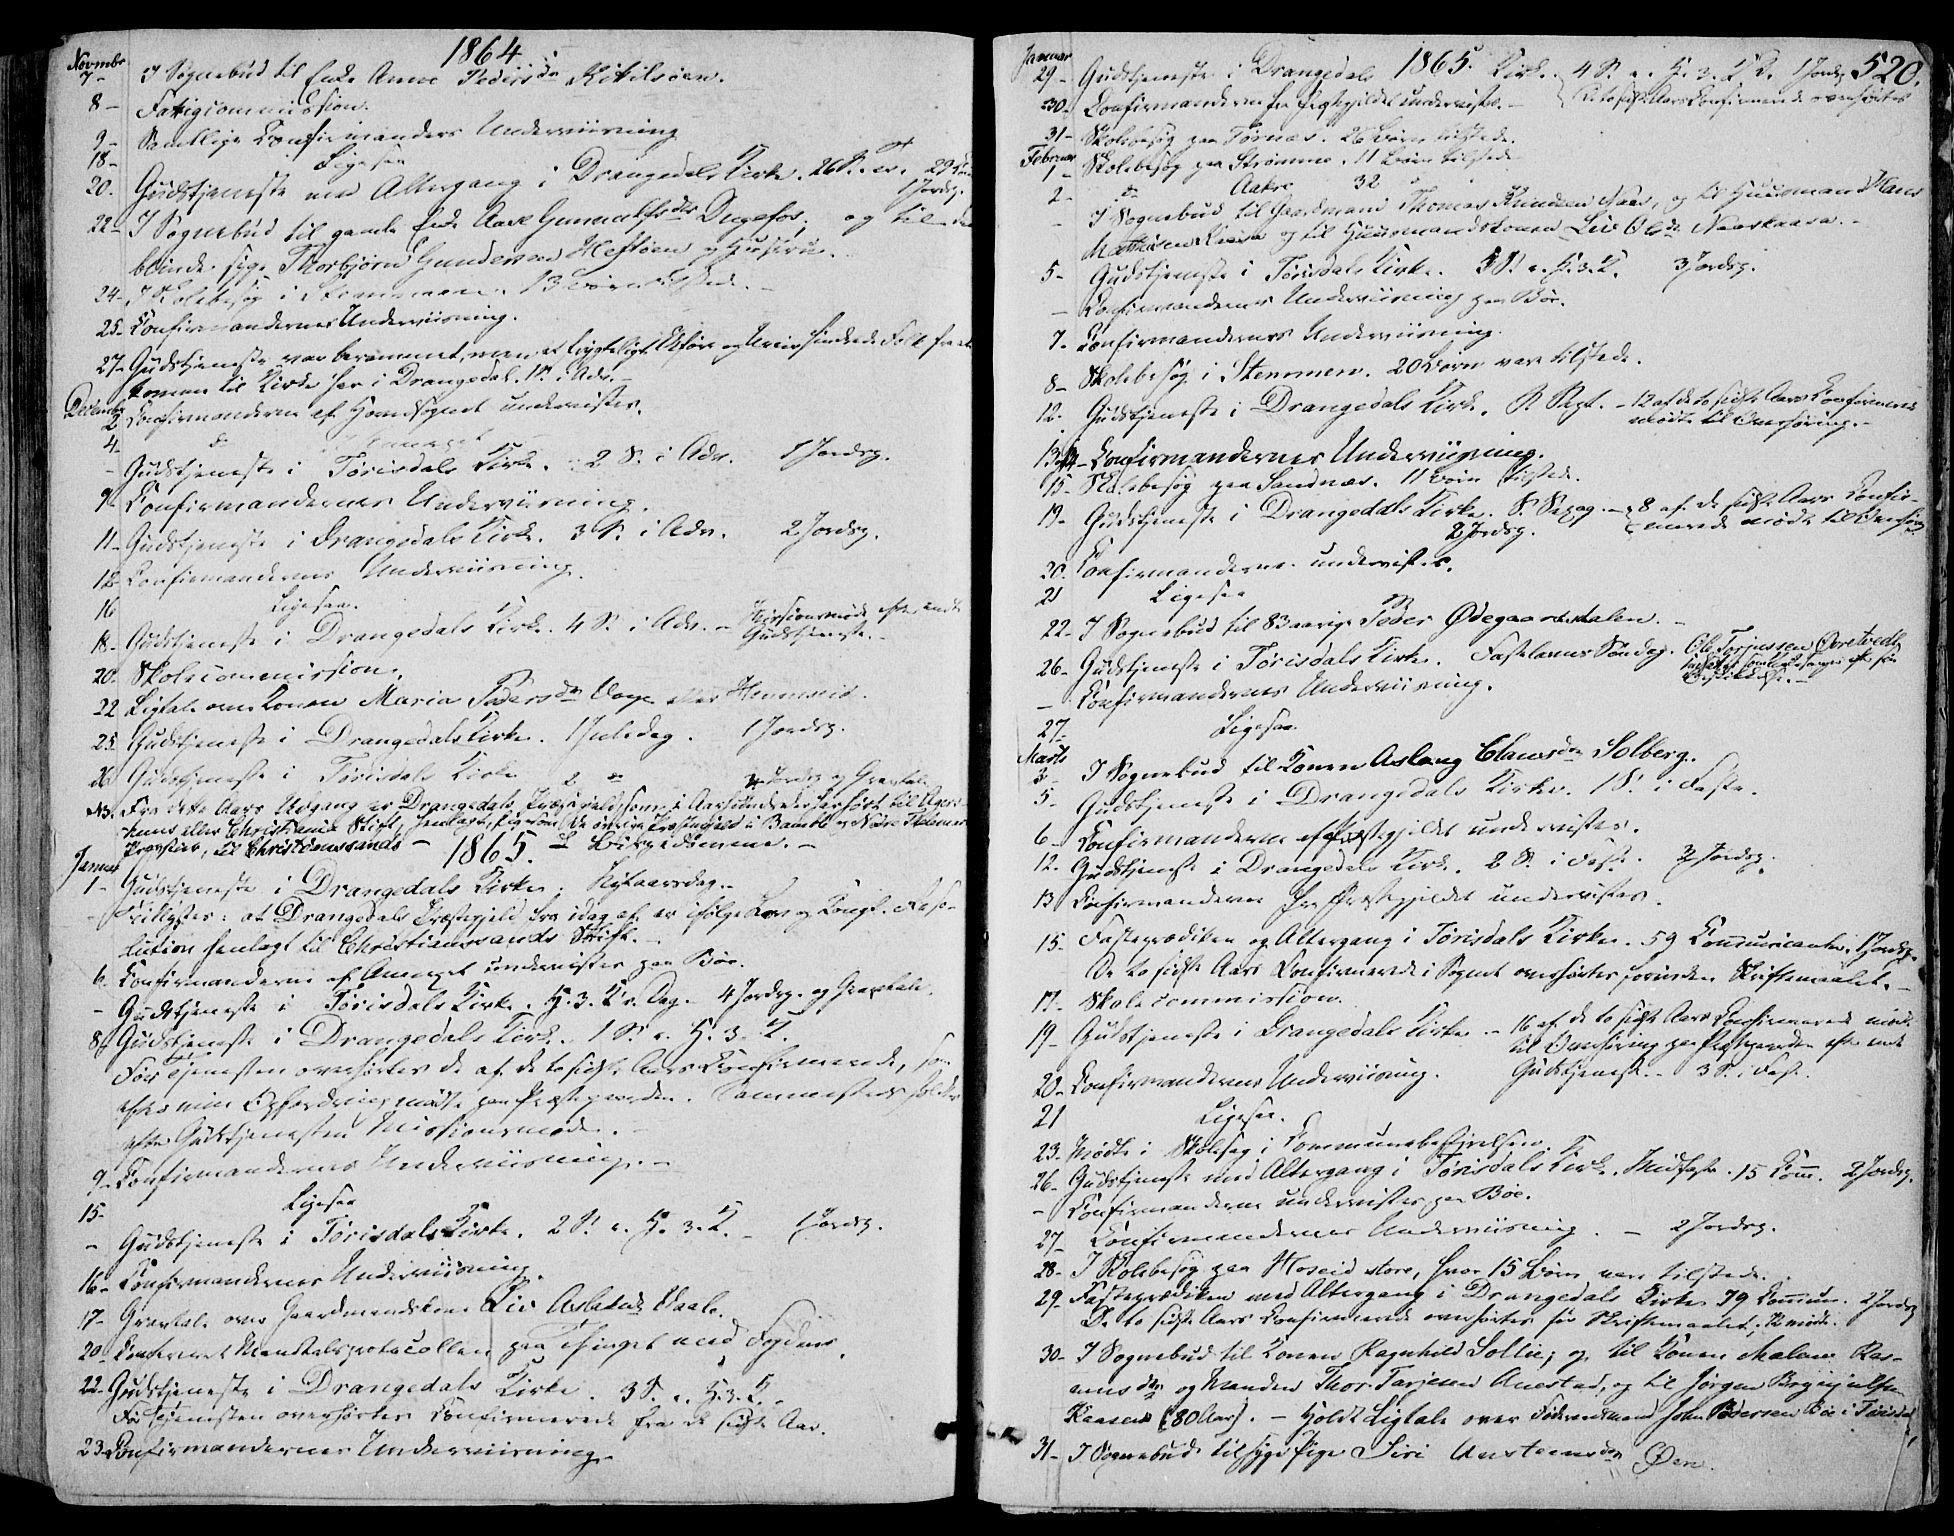 SAKO, Drangedal kirkebøker, F/Fa/L0008: Ministerialbok nr. 8, 1857-1871, s. 520